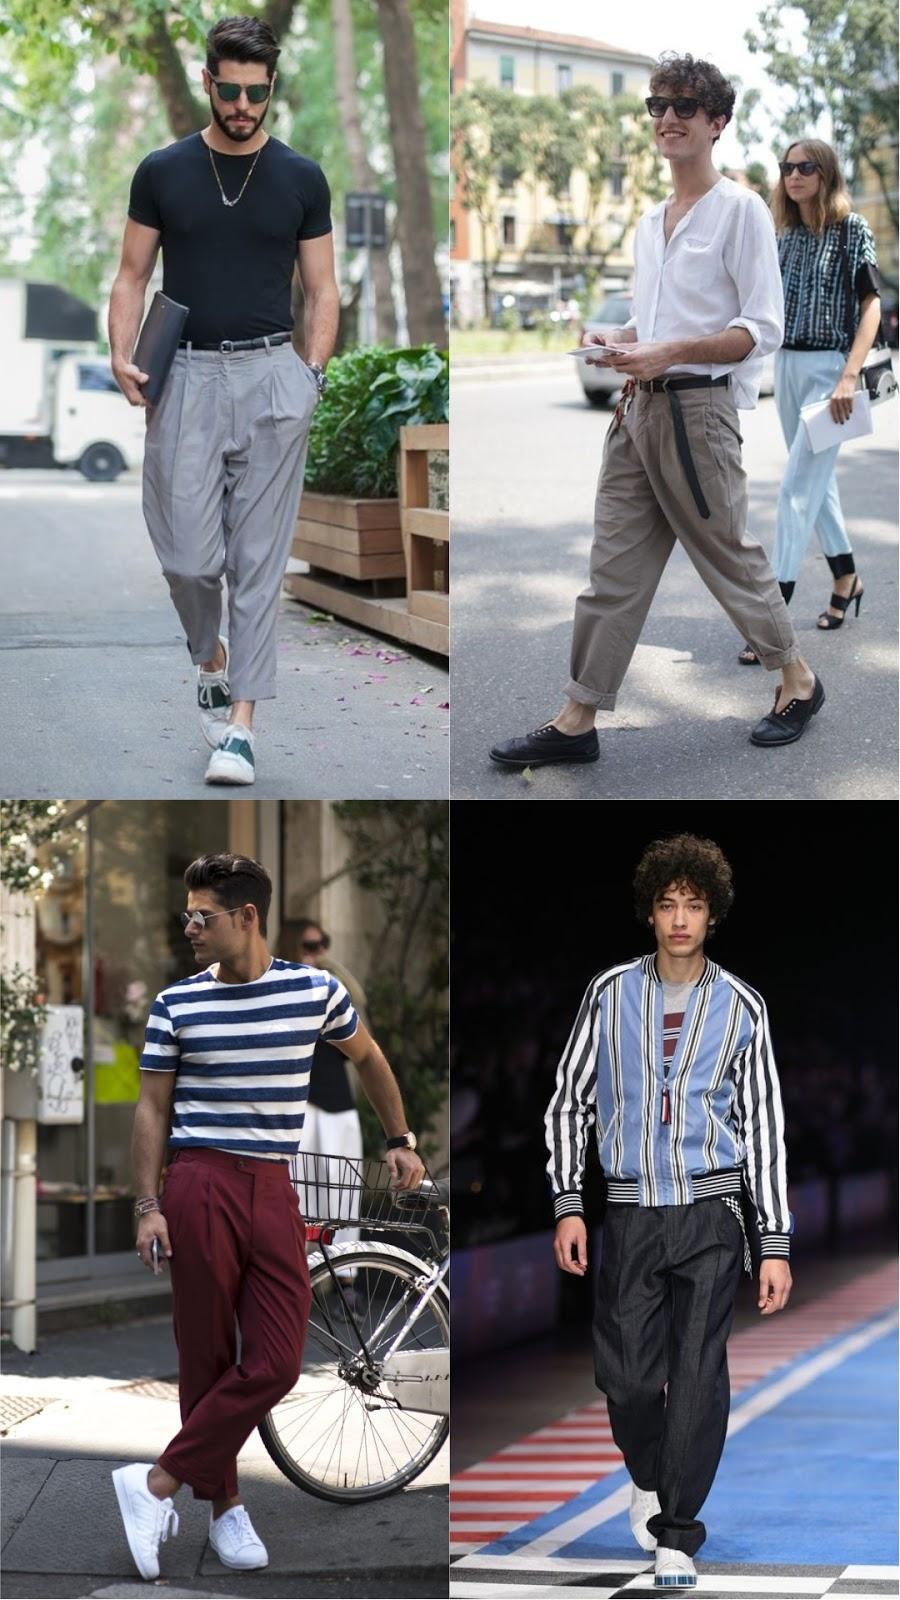 tendencias-moda-masculina-primavera-verao-2019-blog-tres-chic-look-calca-larga-oversize